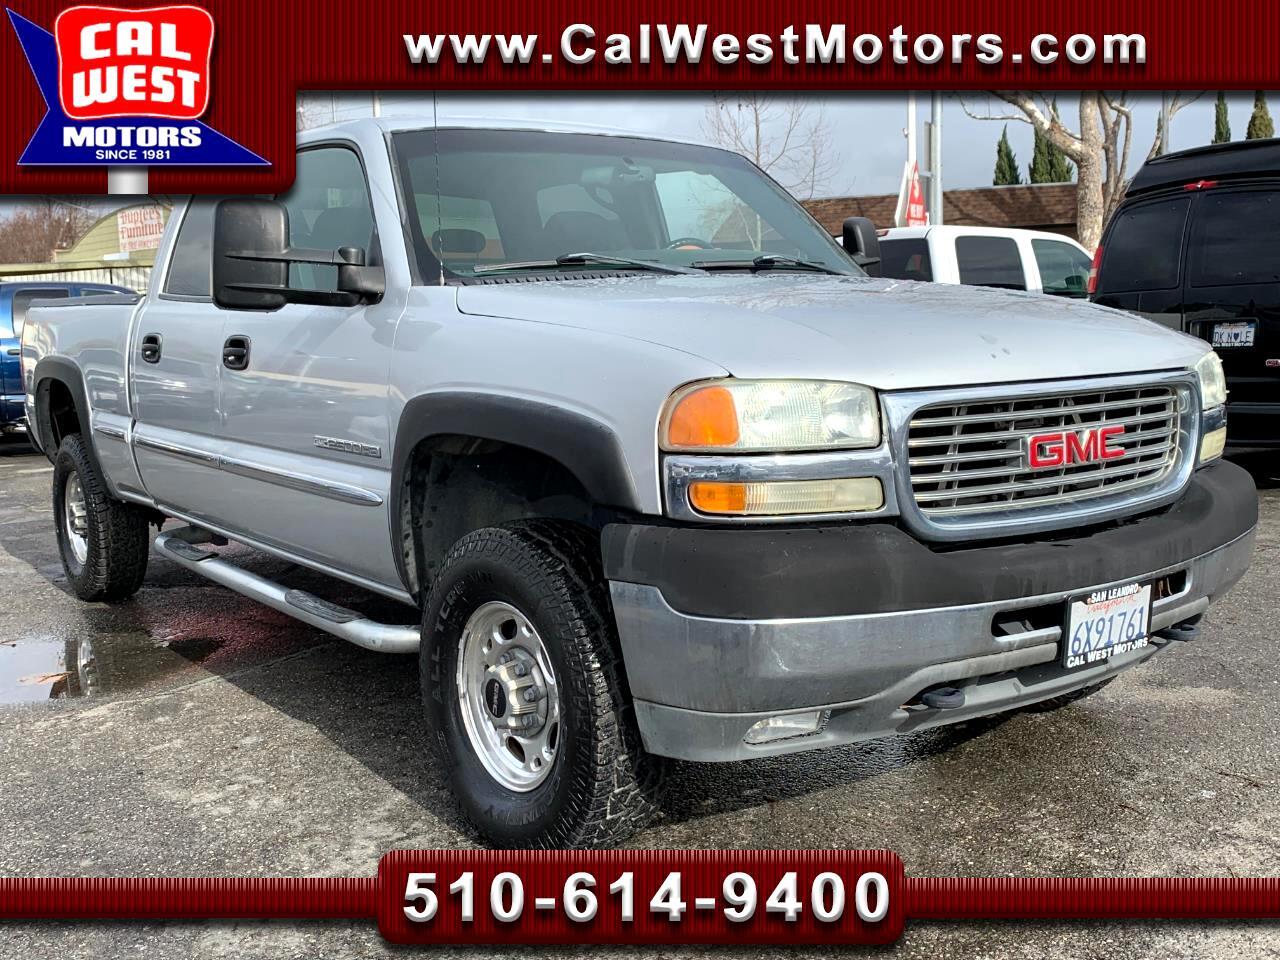 Used Cars San Leandro Oakland Alam Ca Used Cars Trucks Ca Cal